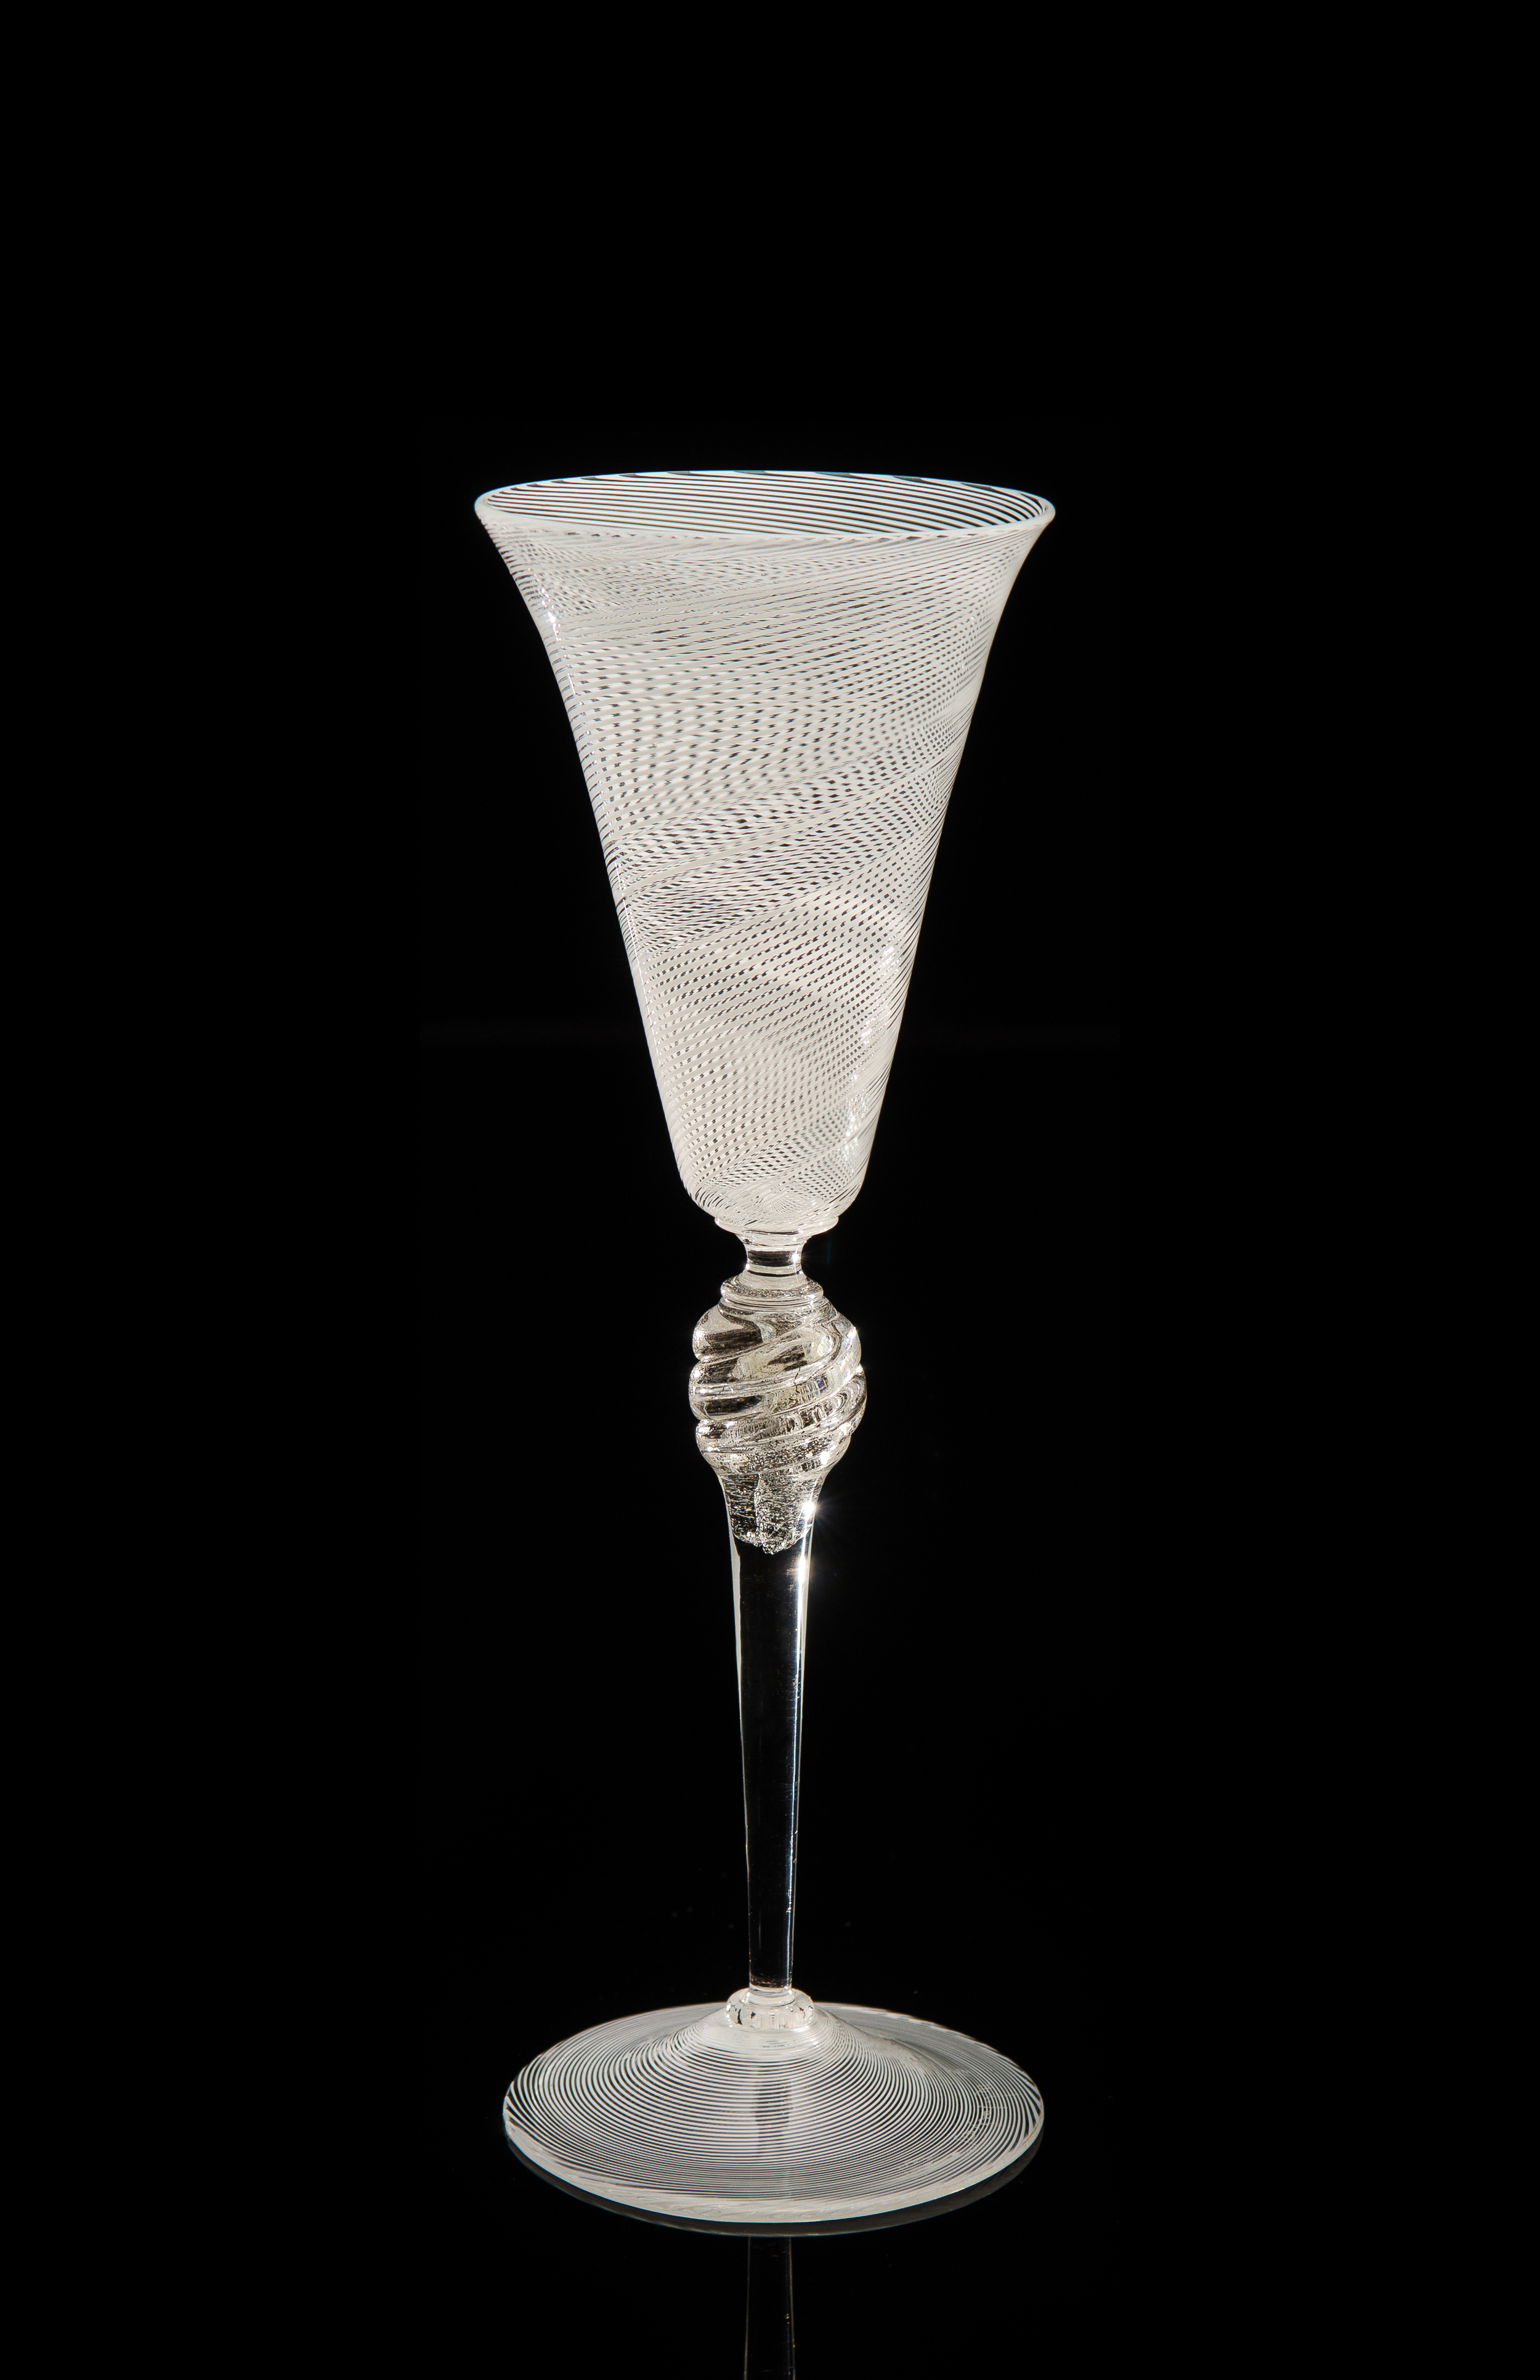 Lino Tagliapietra, Goblet (1991-1994, glass, 10 x 3 3/8 x 3 3/8 inches), LT.78